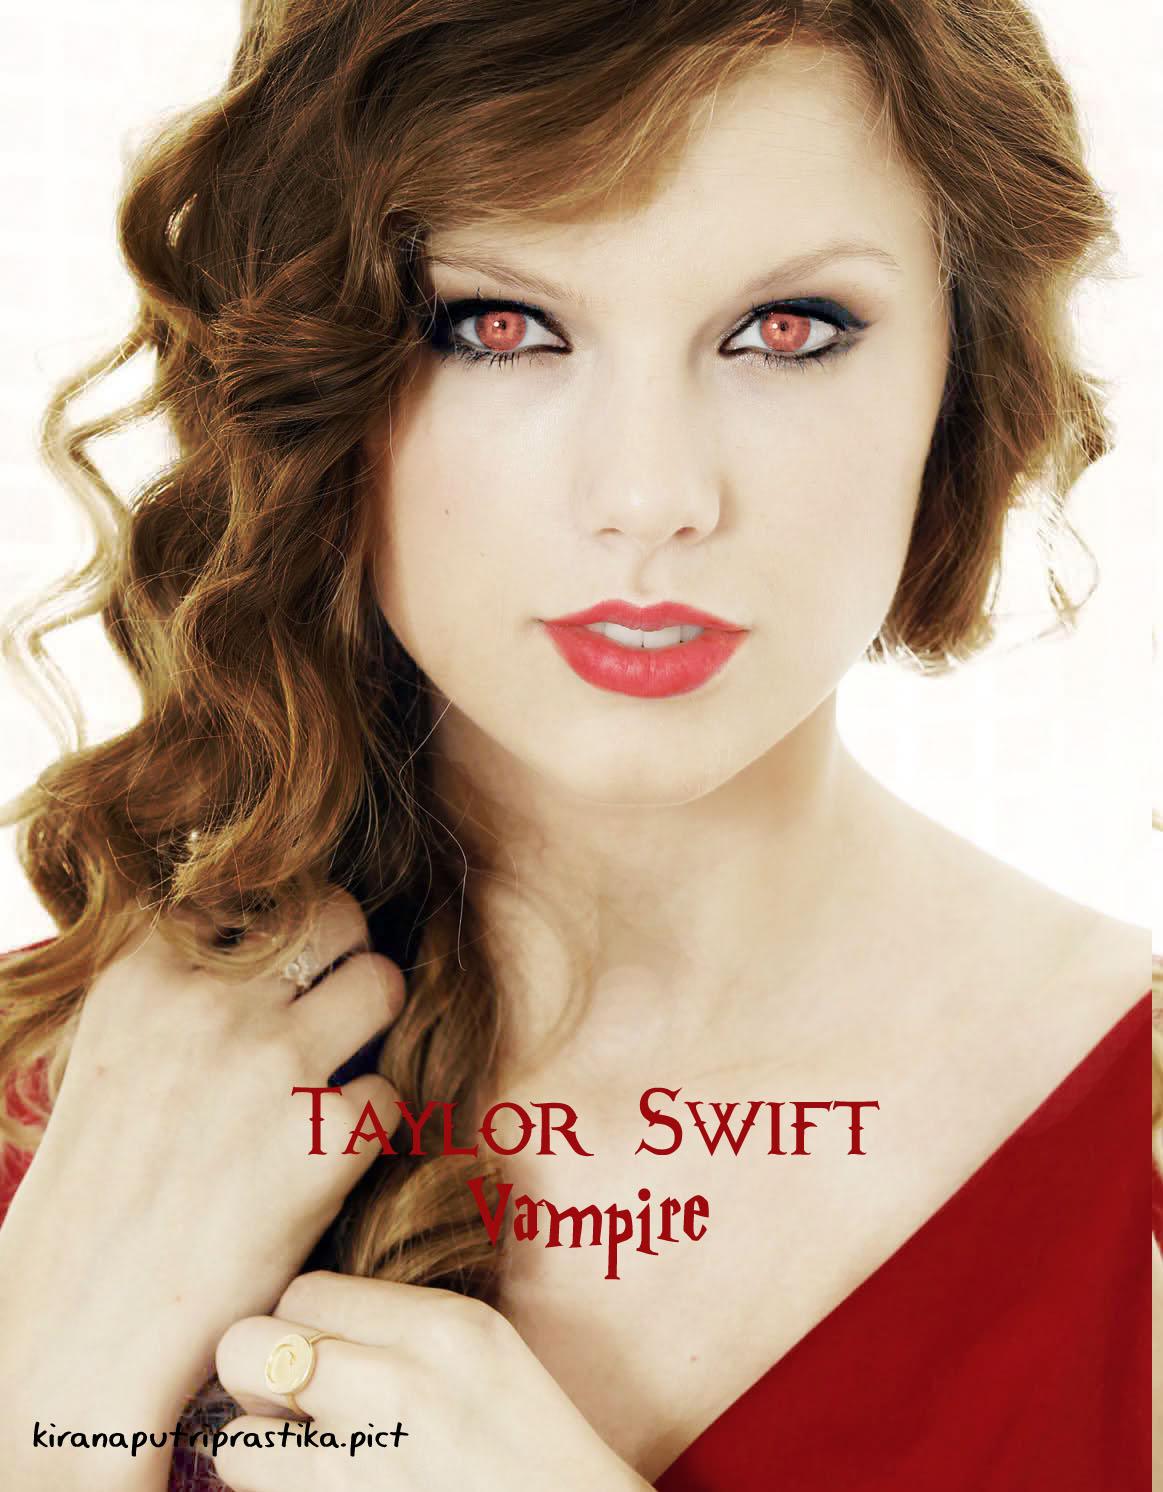 http://1.bp.blogspot.com/-OTZqIH6mDro/TaFycPorxmI/AAAAAAAAAP0/OBqYM0G7ulA/s1600/Taylor_Swift_Cool_00+copy.jpg